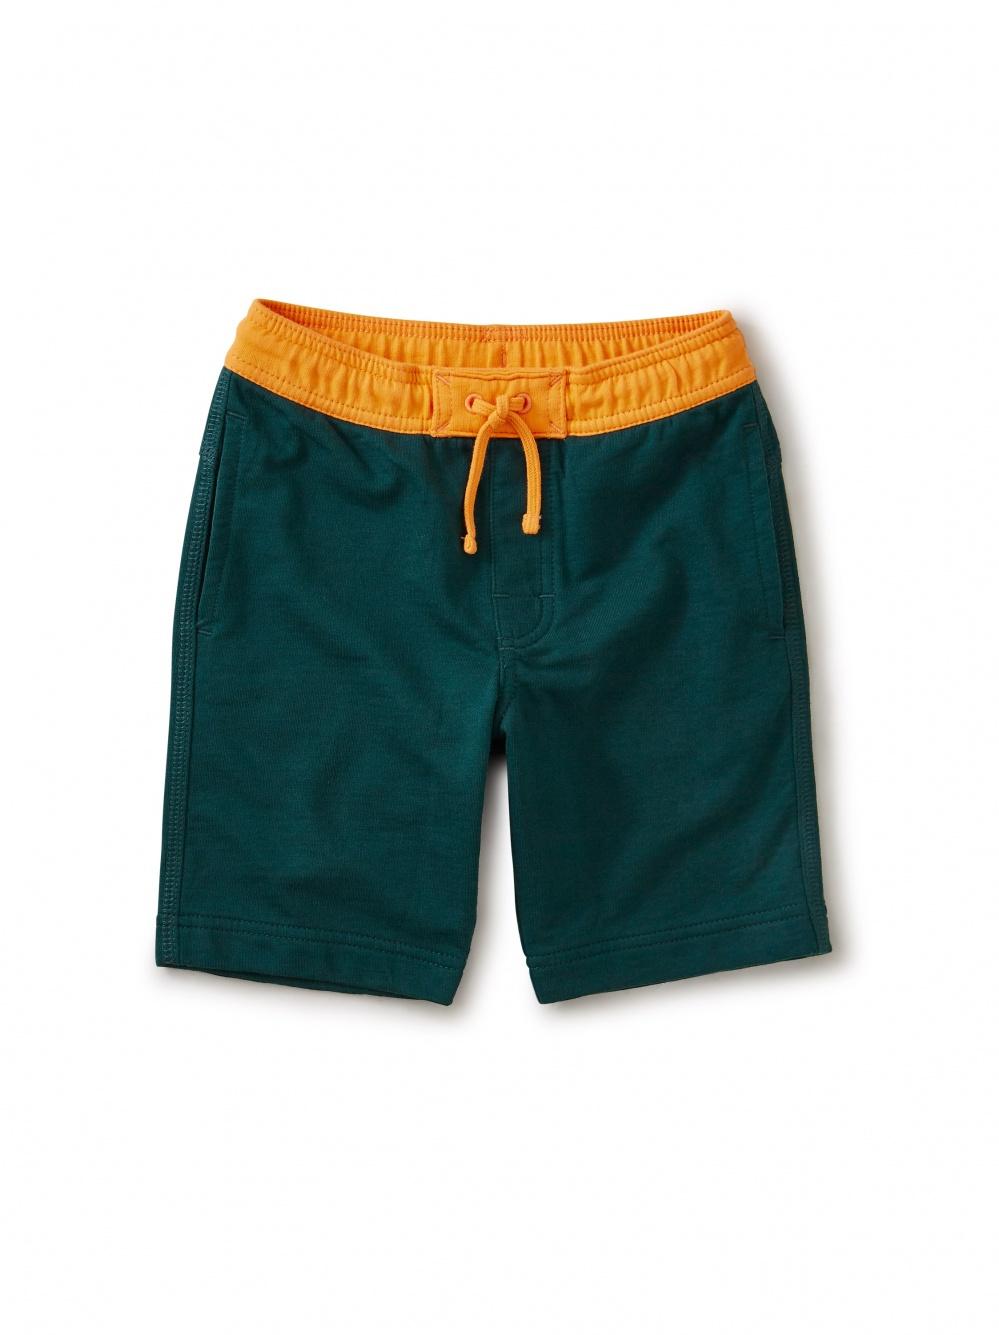 Boardies Surf Shorts